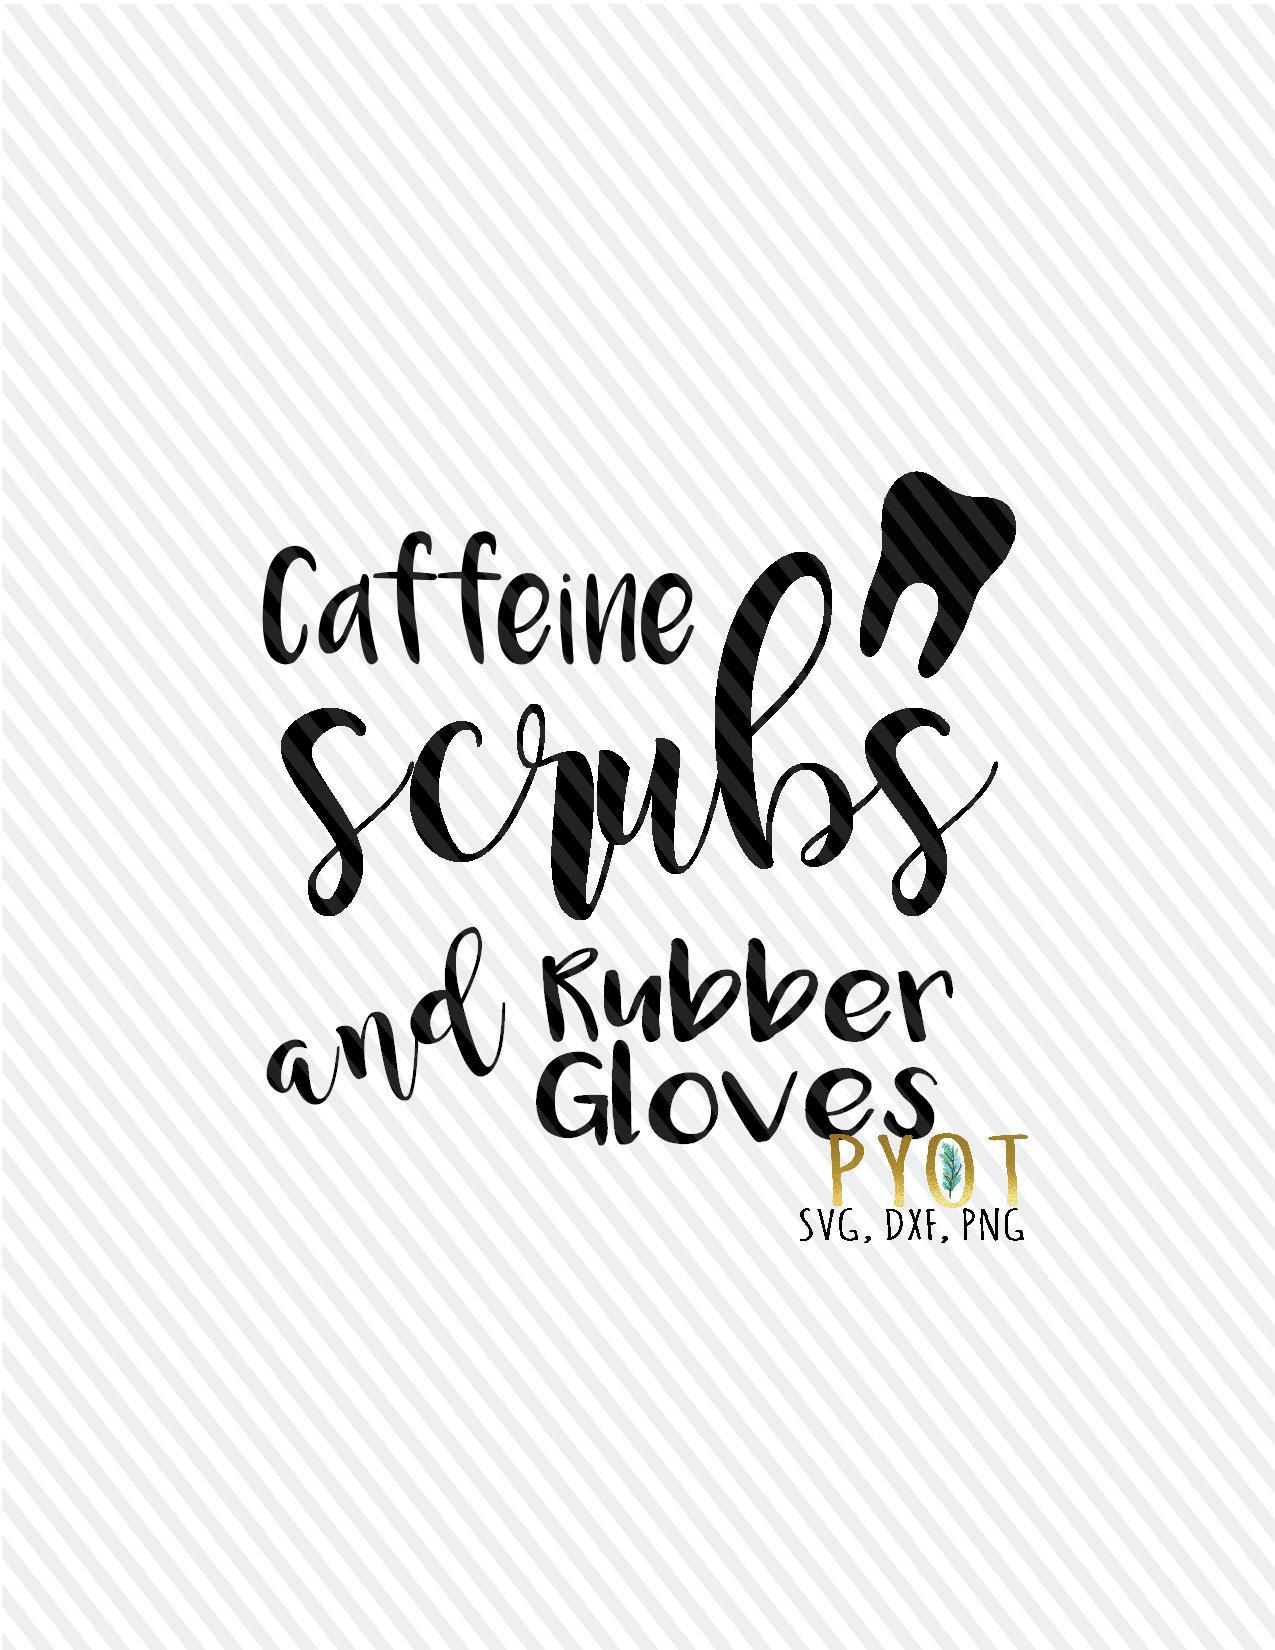 scrub tech svg topsimages Surgery Tech caffeine scrubs and rubber gloves tooth etsy 1275x1650 scrub tech svg